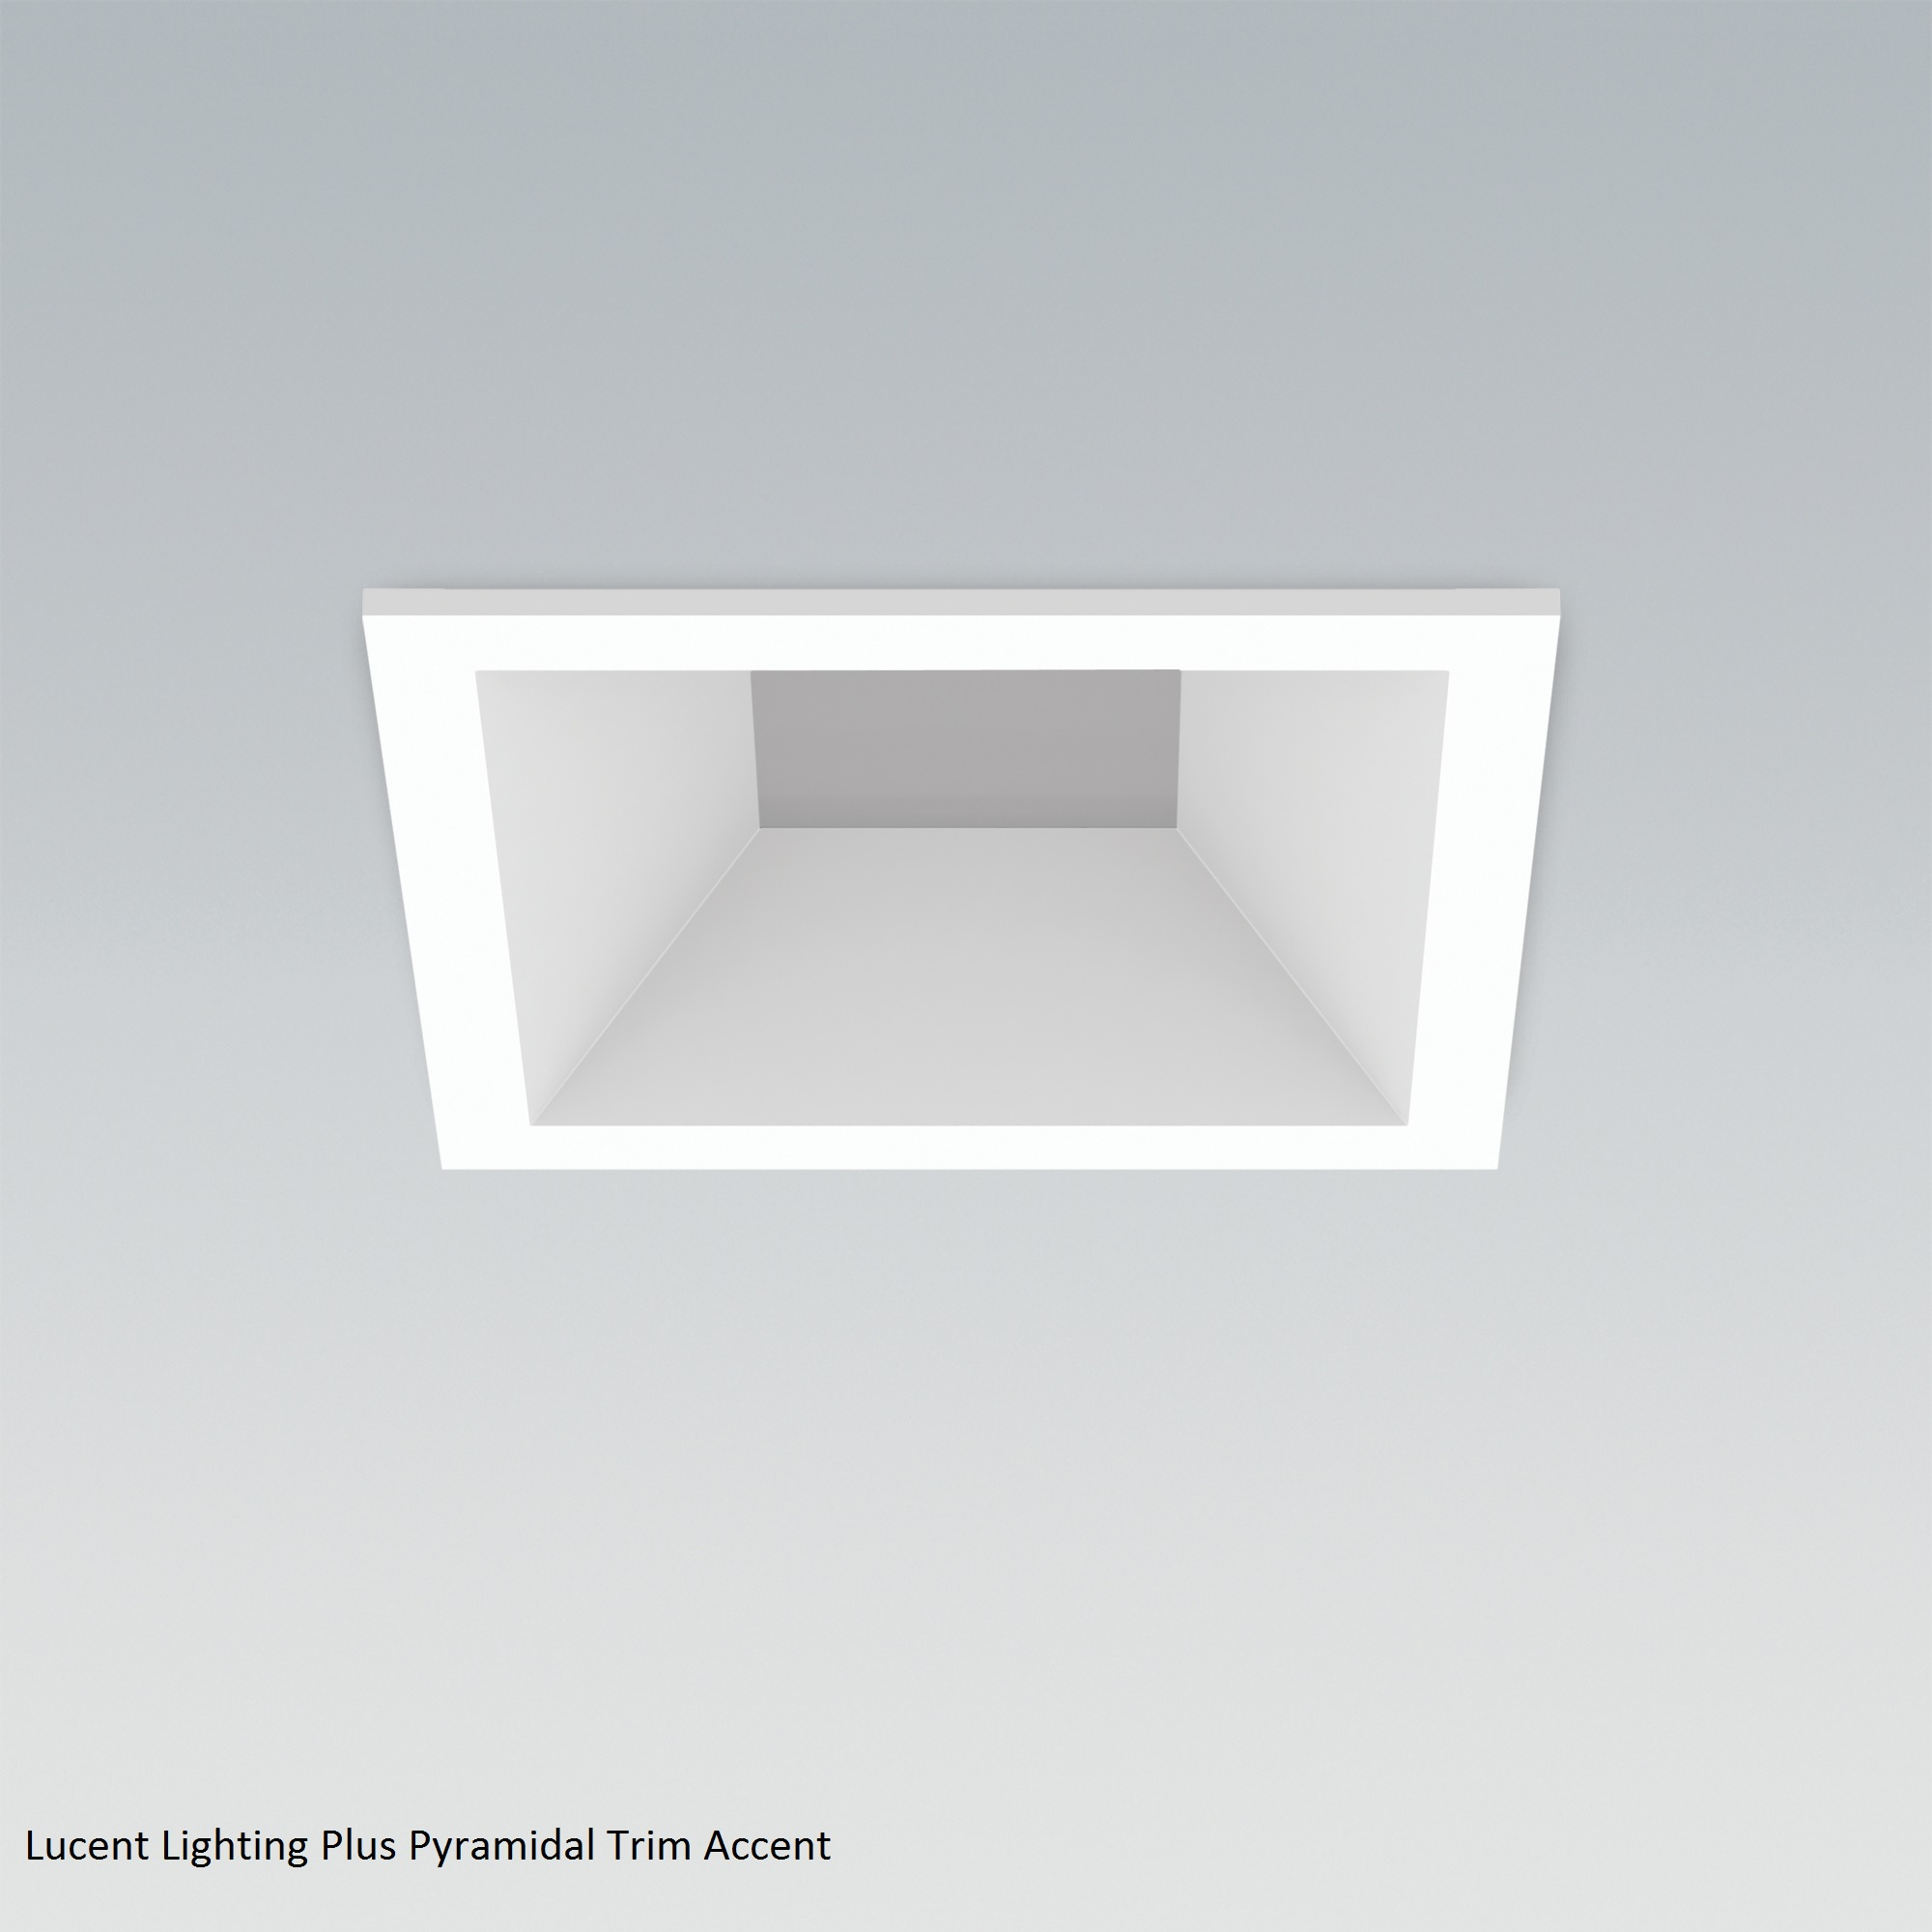 lucent-lighting-plus-pyramidal-trim